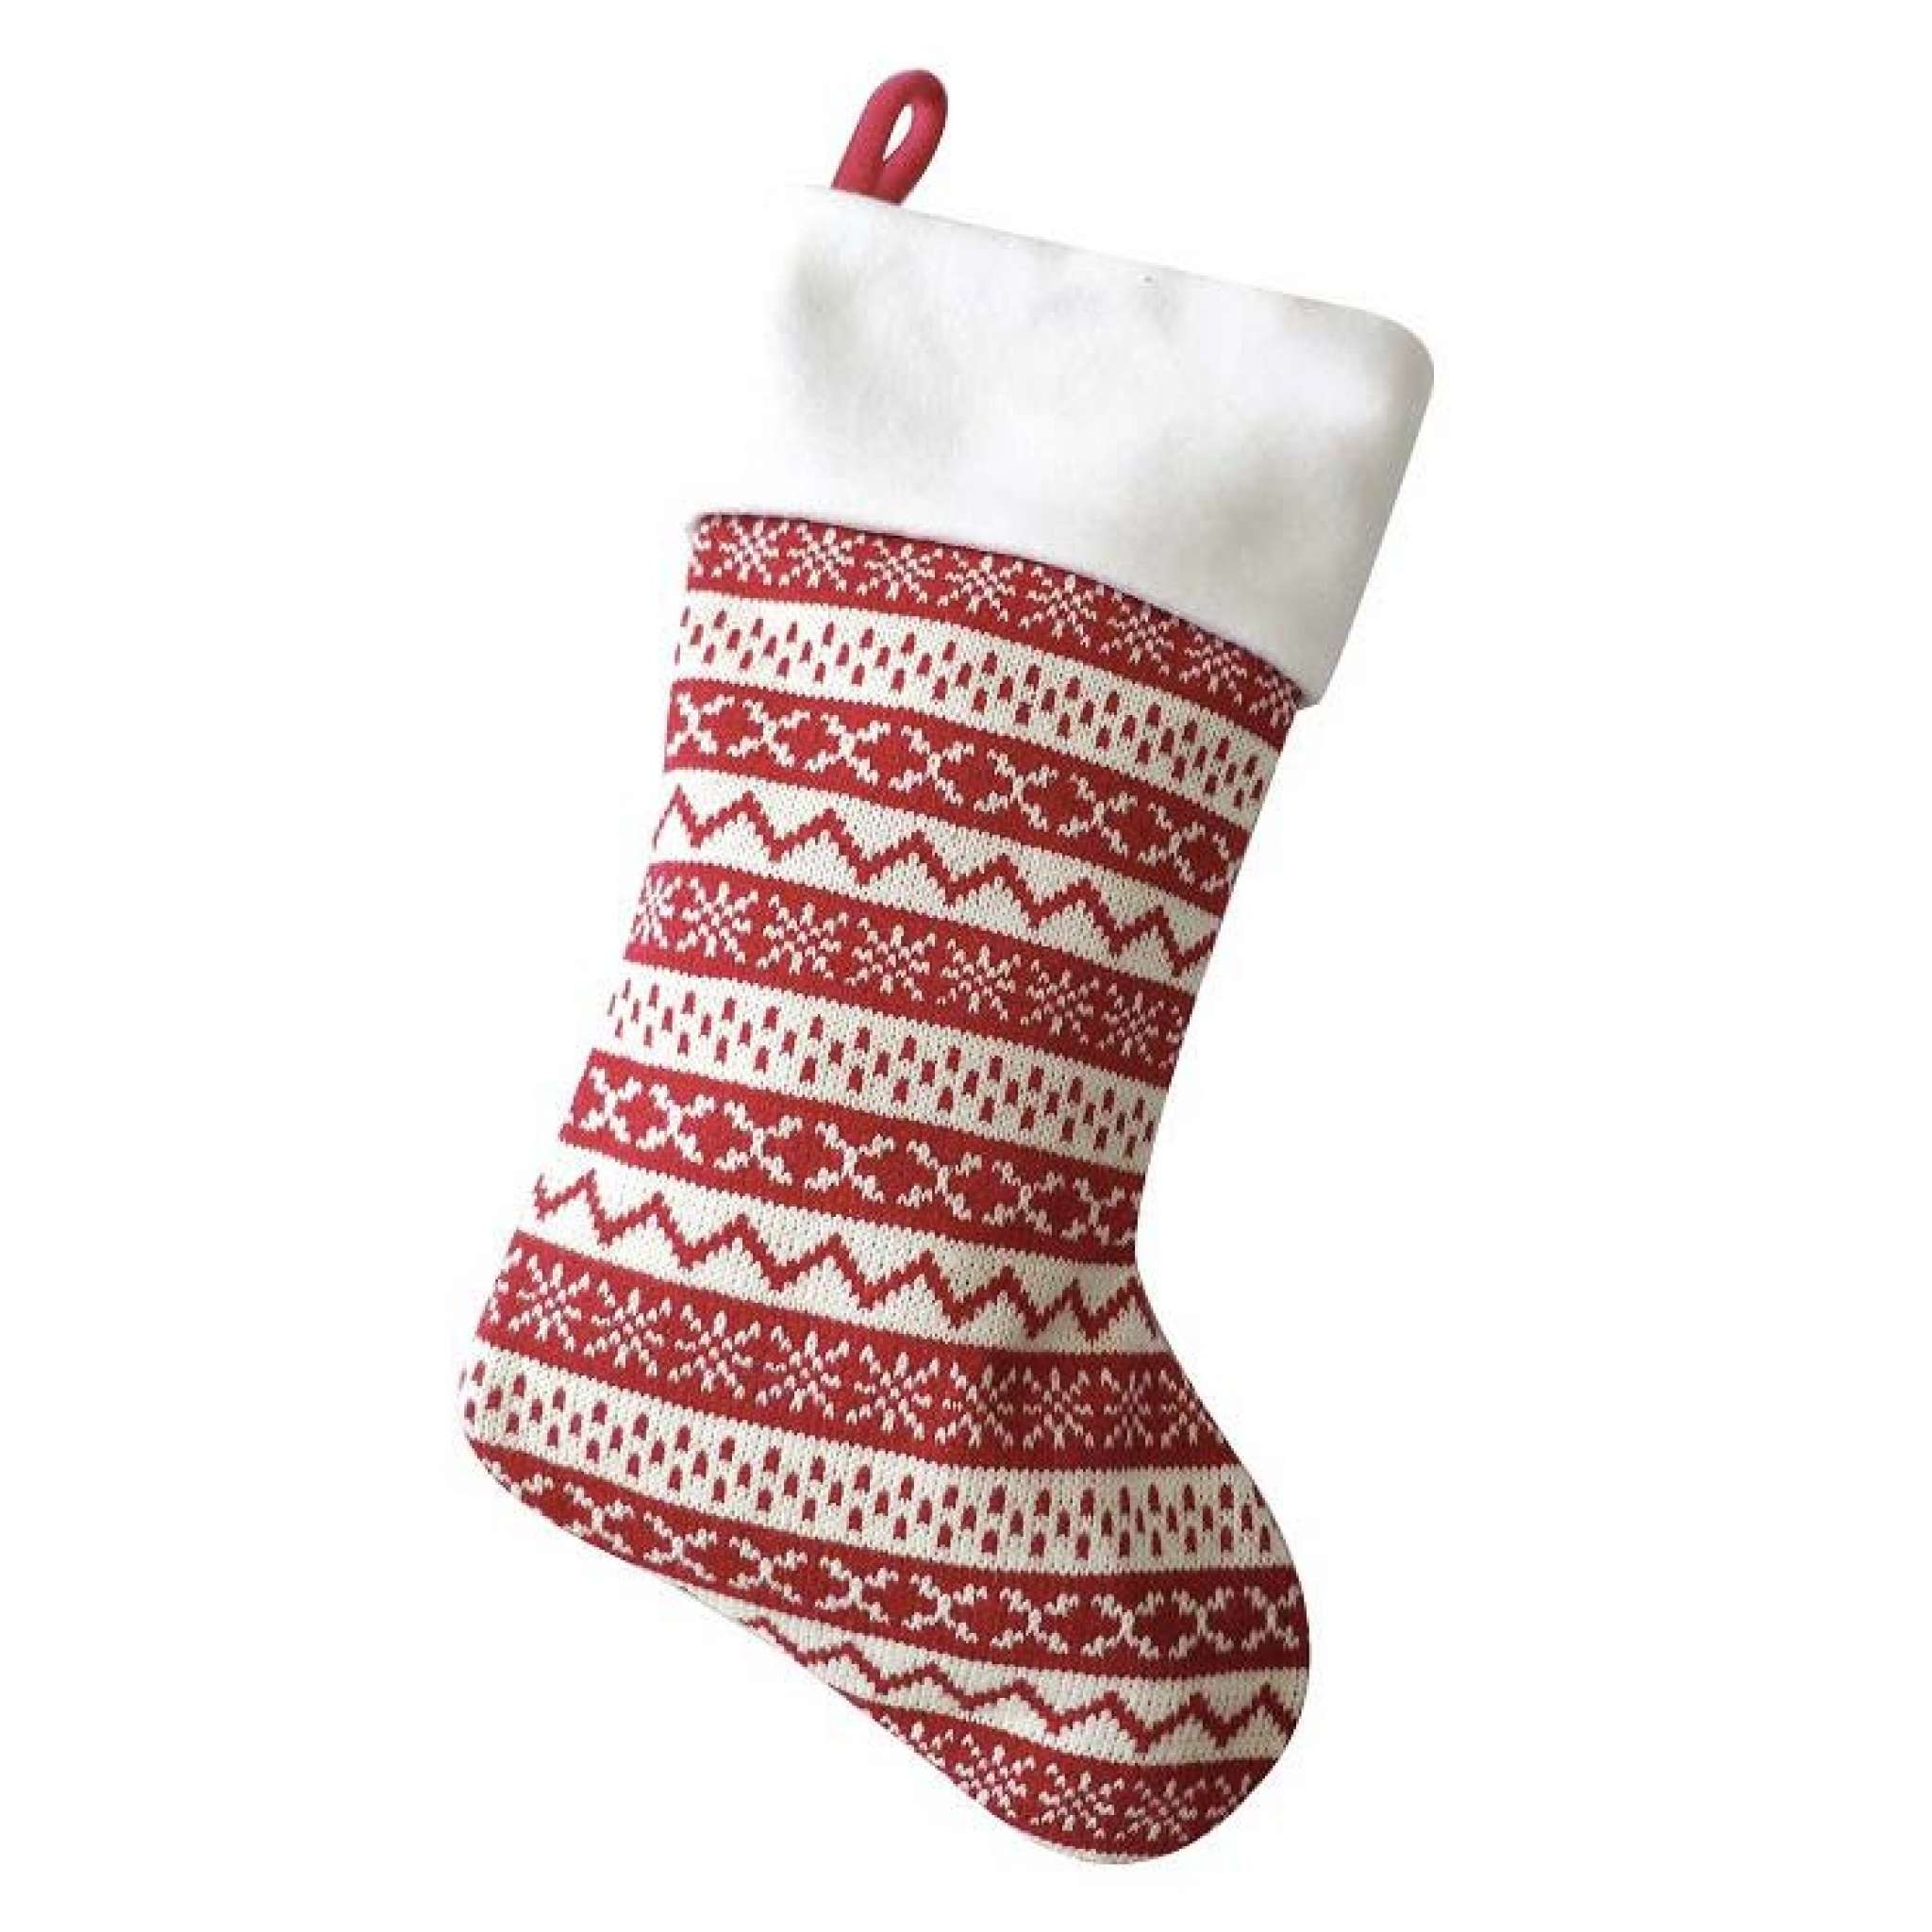 Joulusukka Premium, Punainen Kuvio